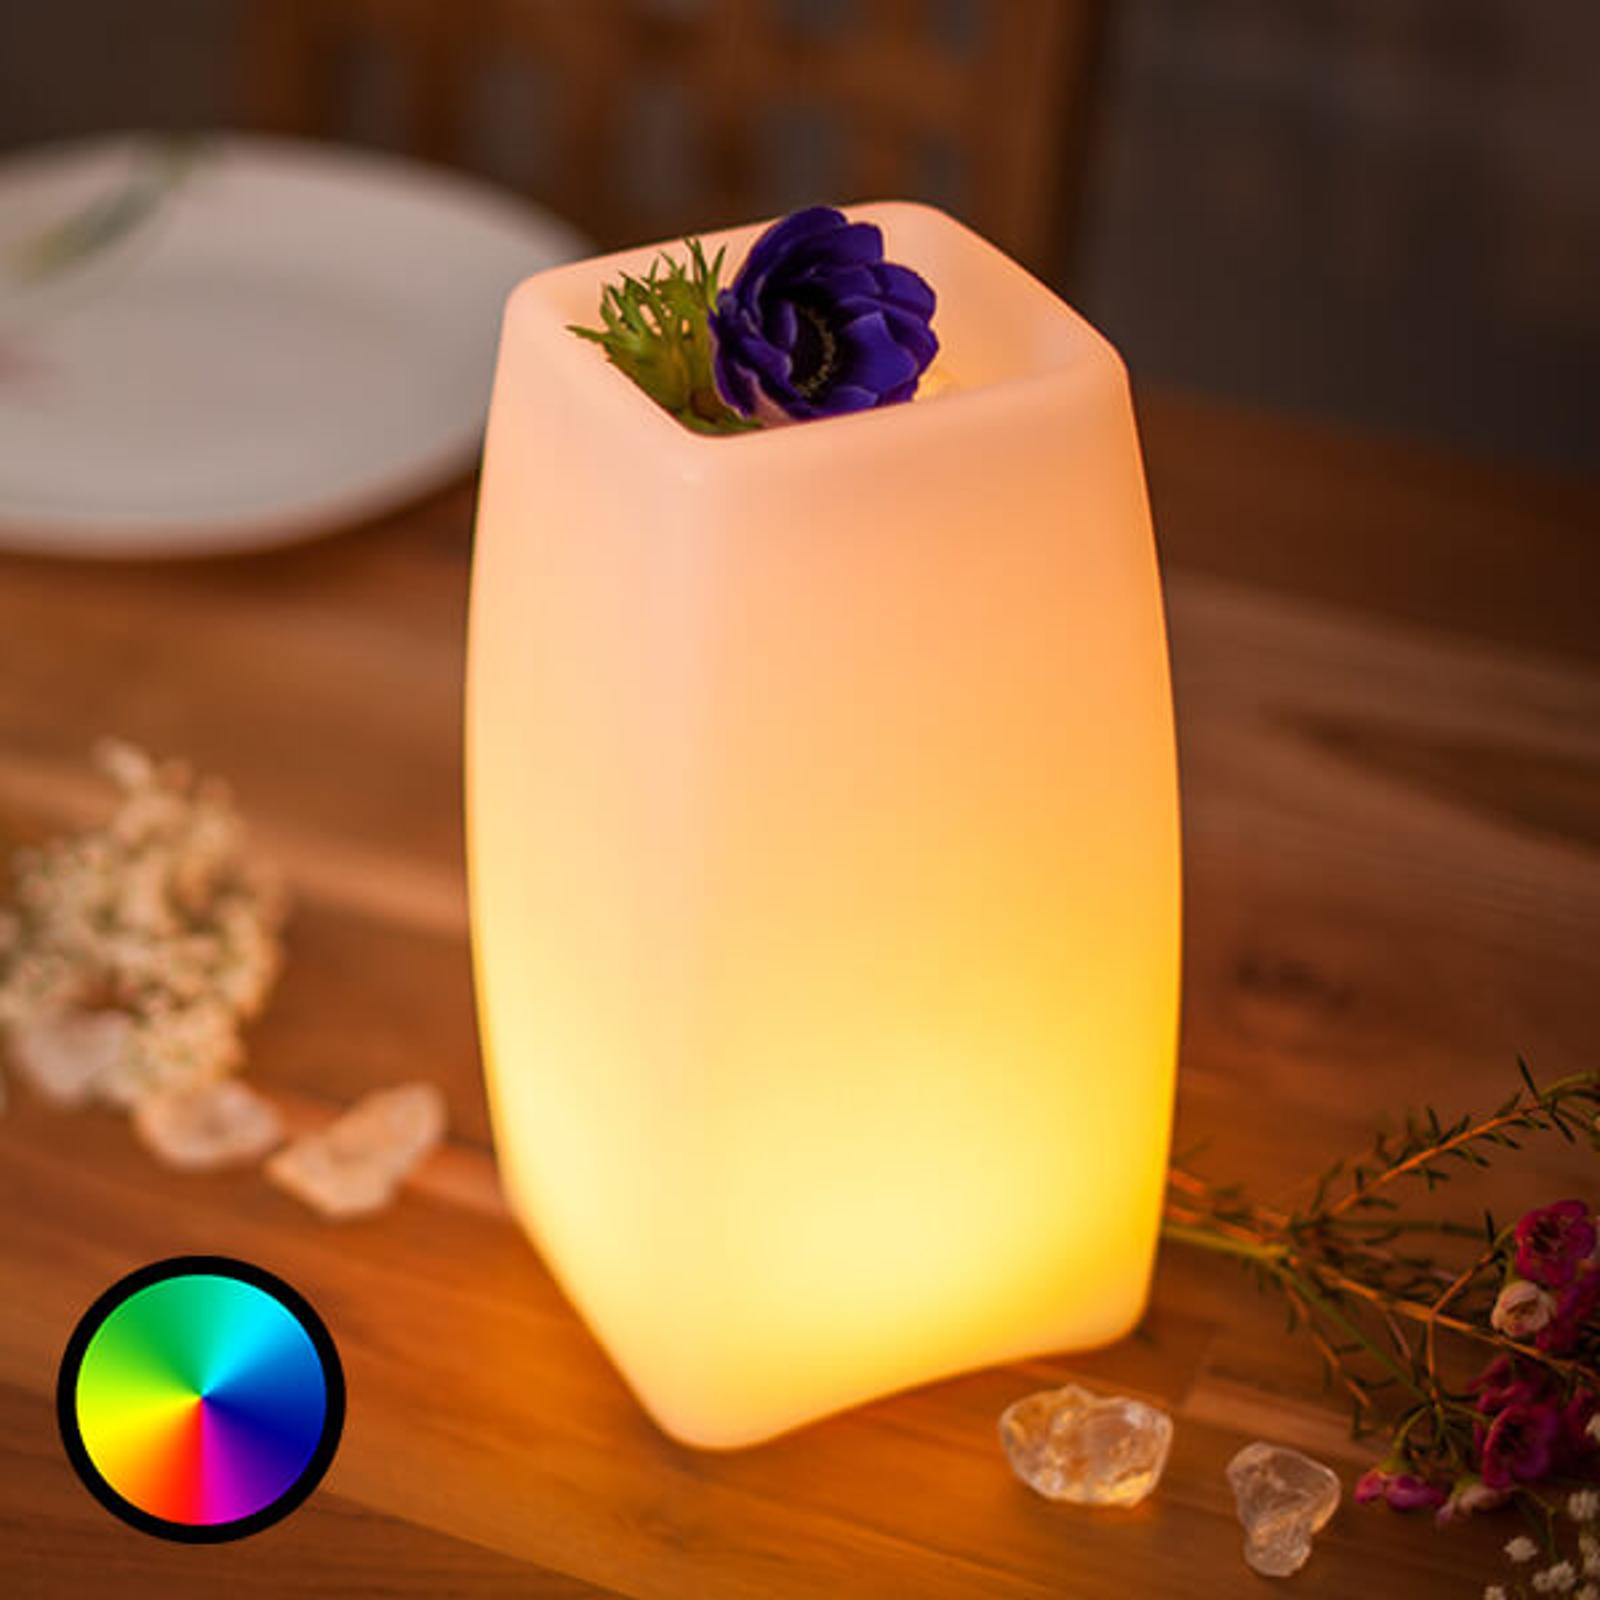 LED-bordlampe Stele, styrbar via app med batteri